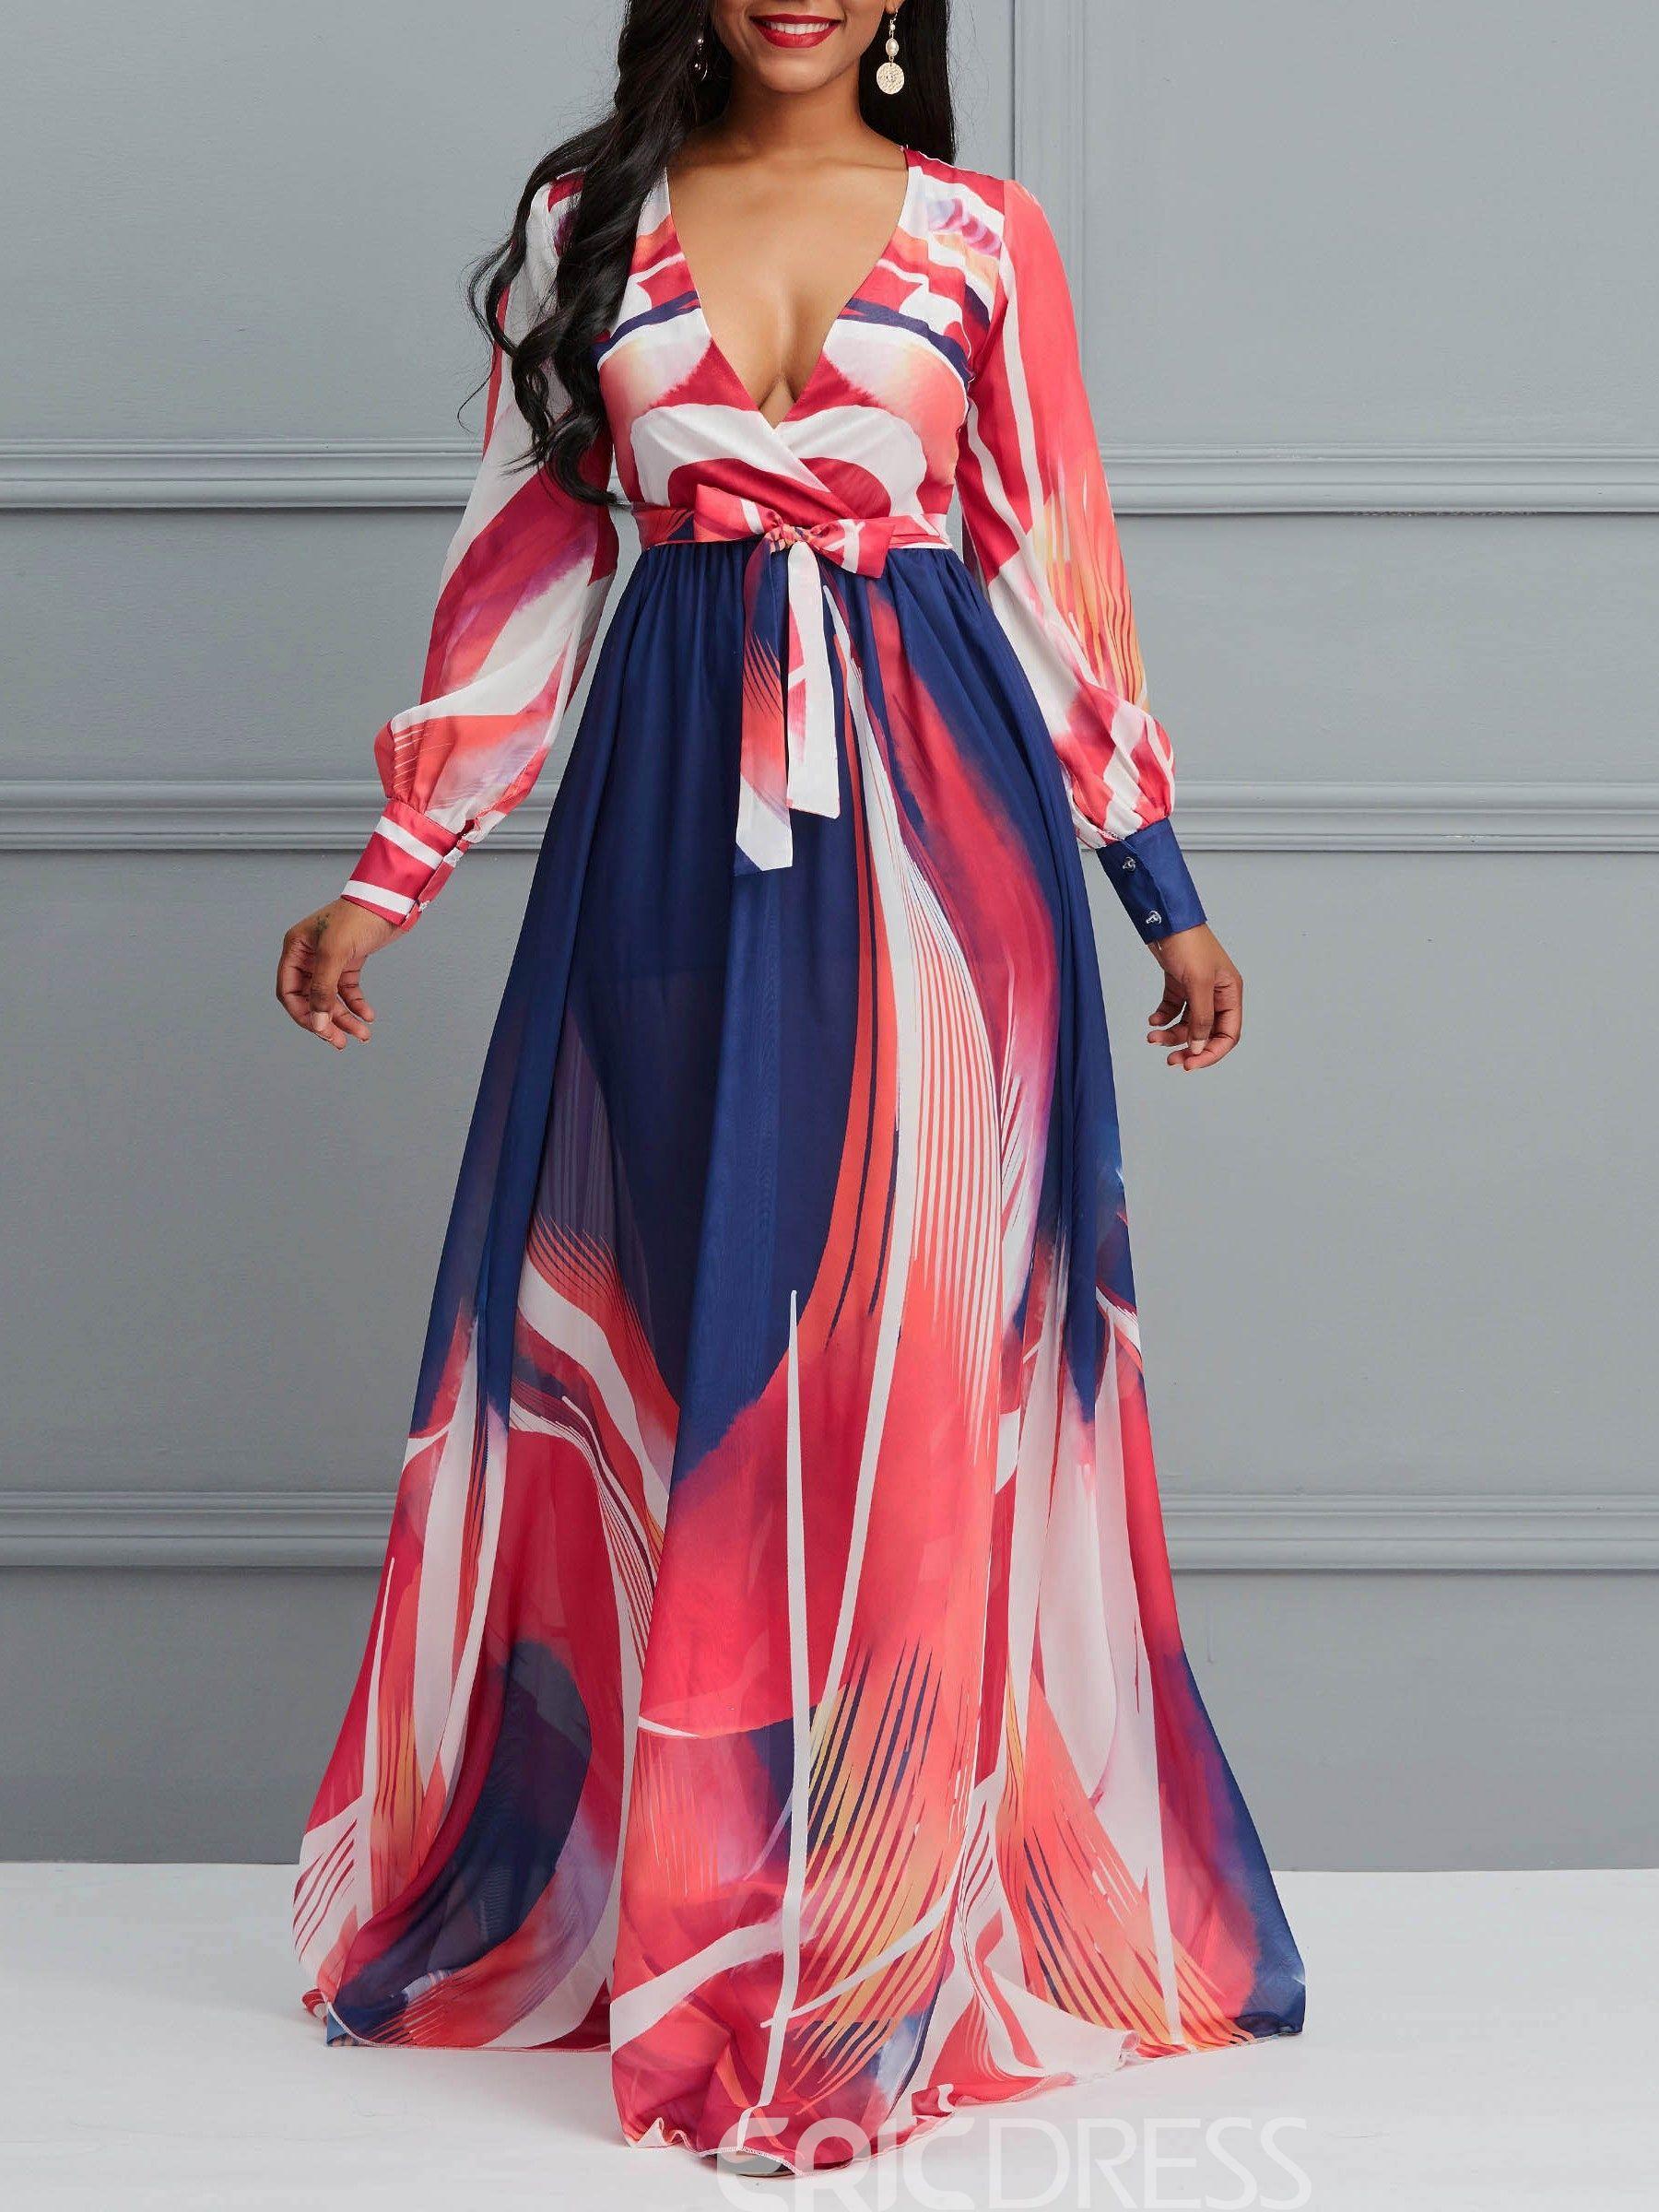 810ad7b2ee856 Ericdress Floor-Length V Neck Print Women s Dress